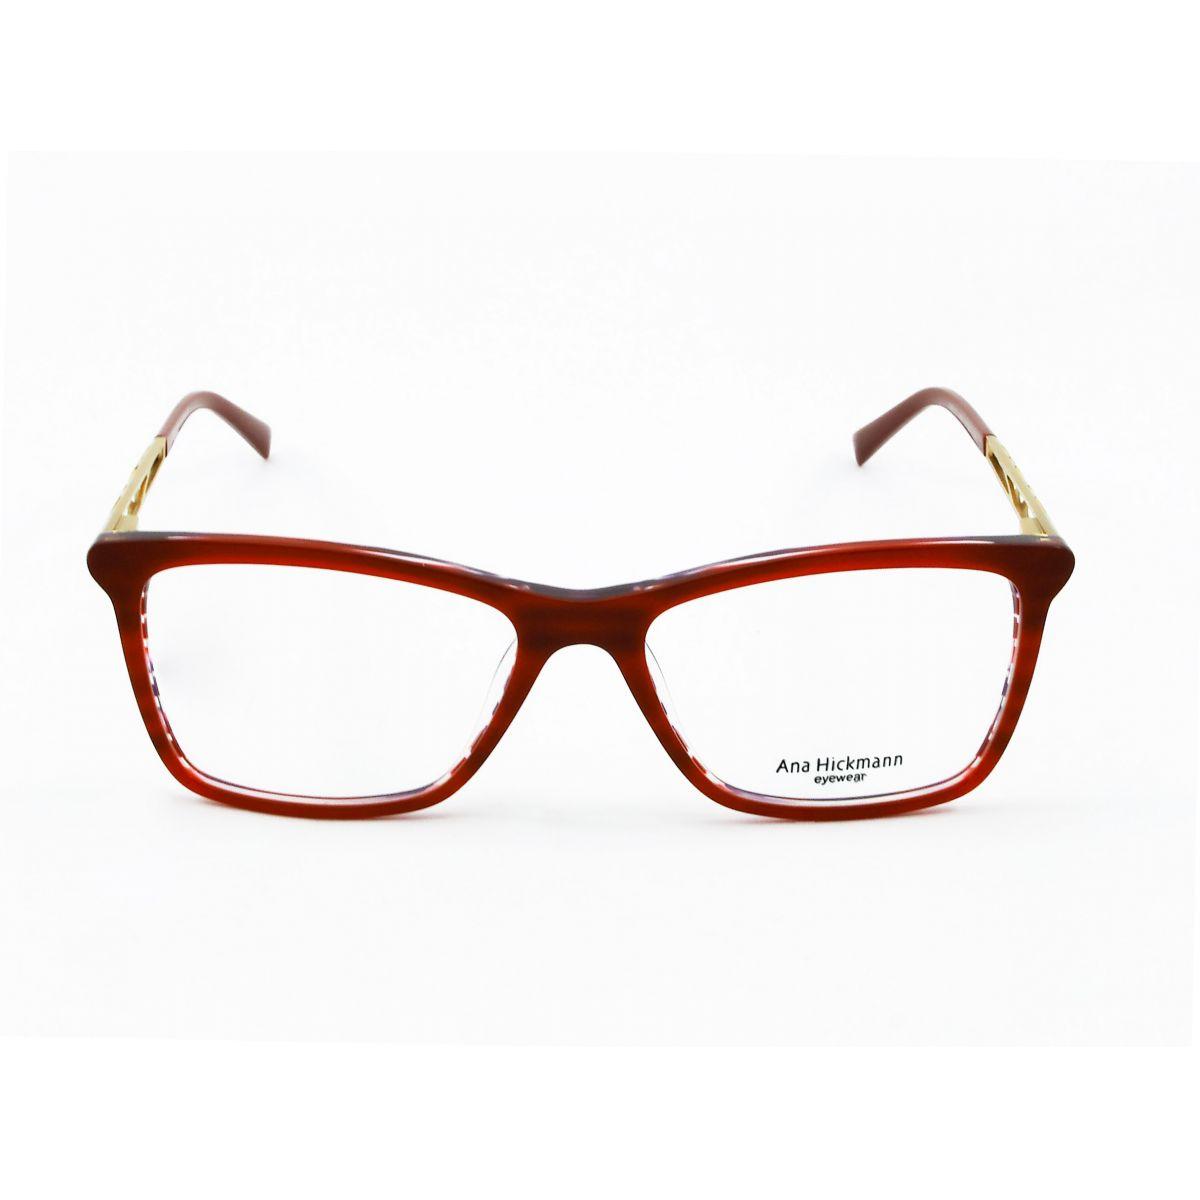 2ed8cd6a9e584 Oculos Grau Oakley Feminino   Les Baux-de-Provence